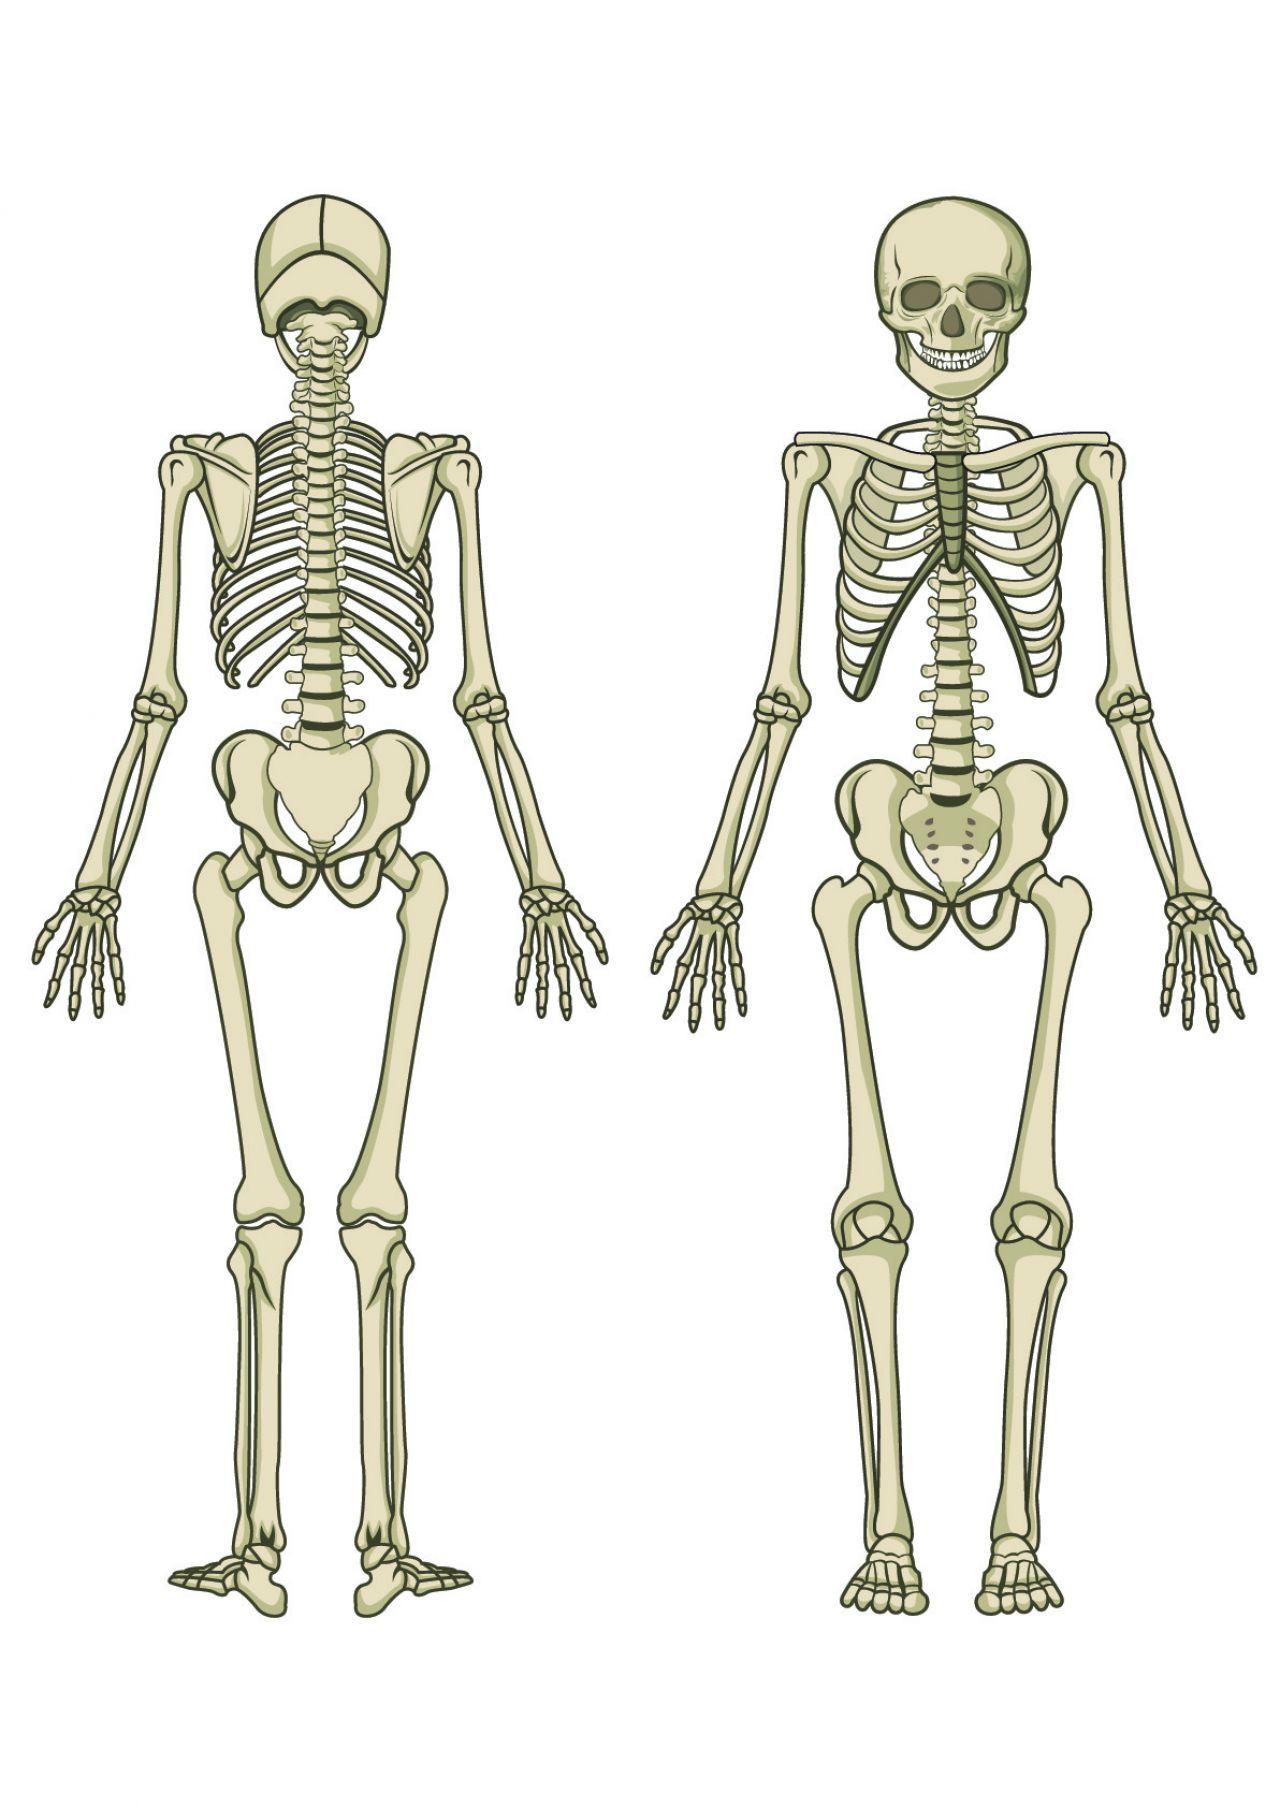 Human Skeleton Bones Human Skeleton Human Skeleton Bones Human Skeletal System